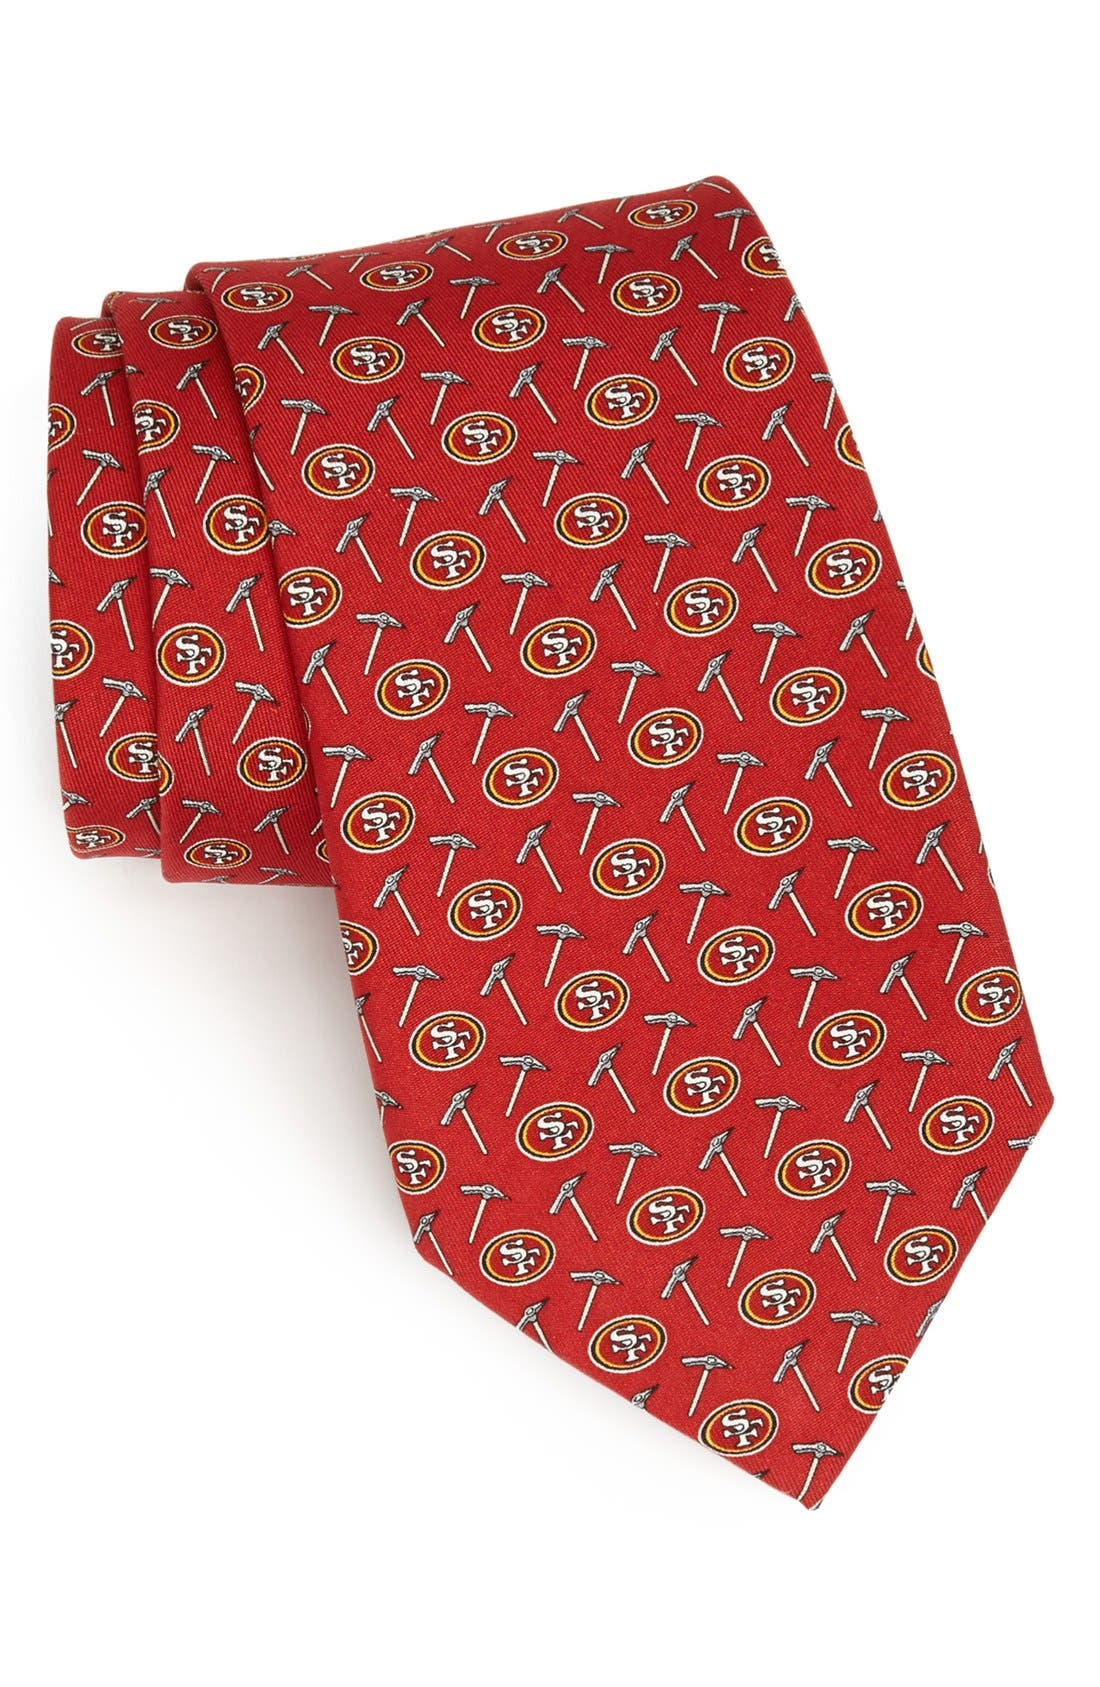 VINEYARD VINES, San Francisco 49ers Print Tie, Main thumbnail 1, color, RED